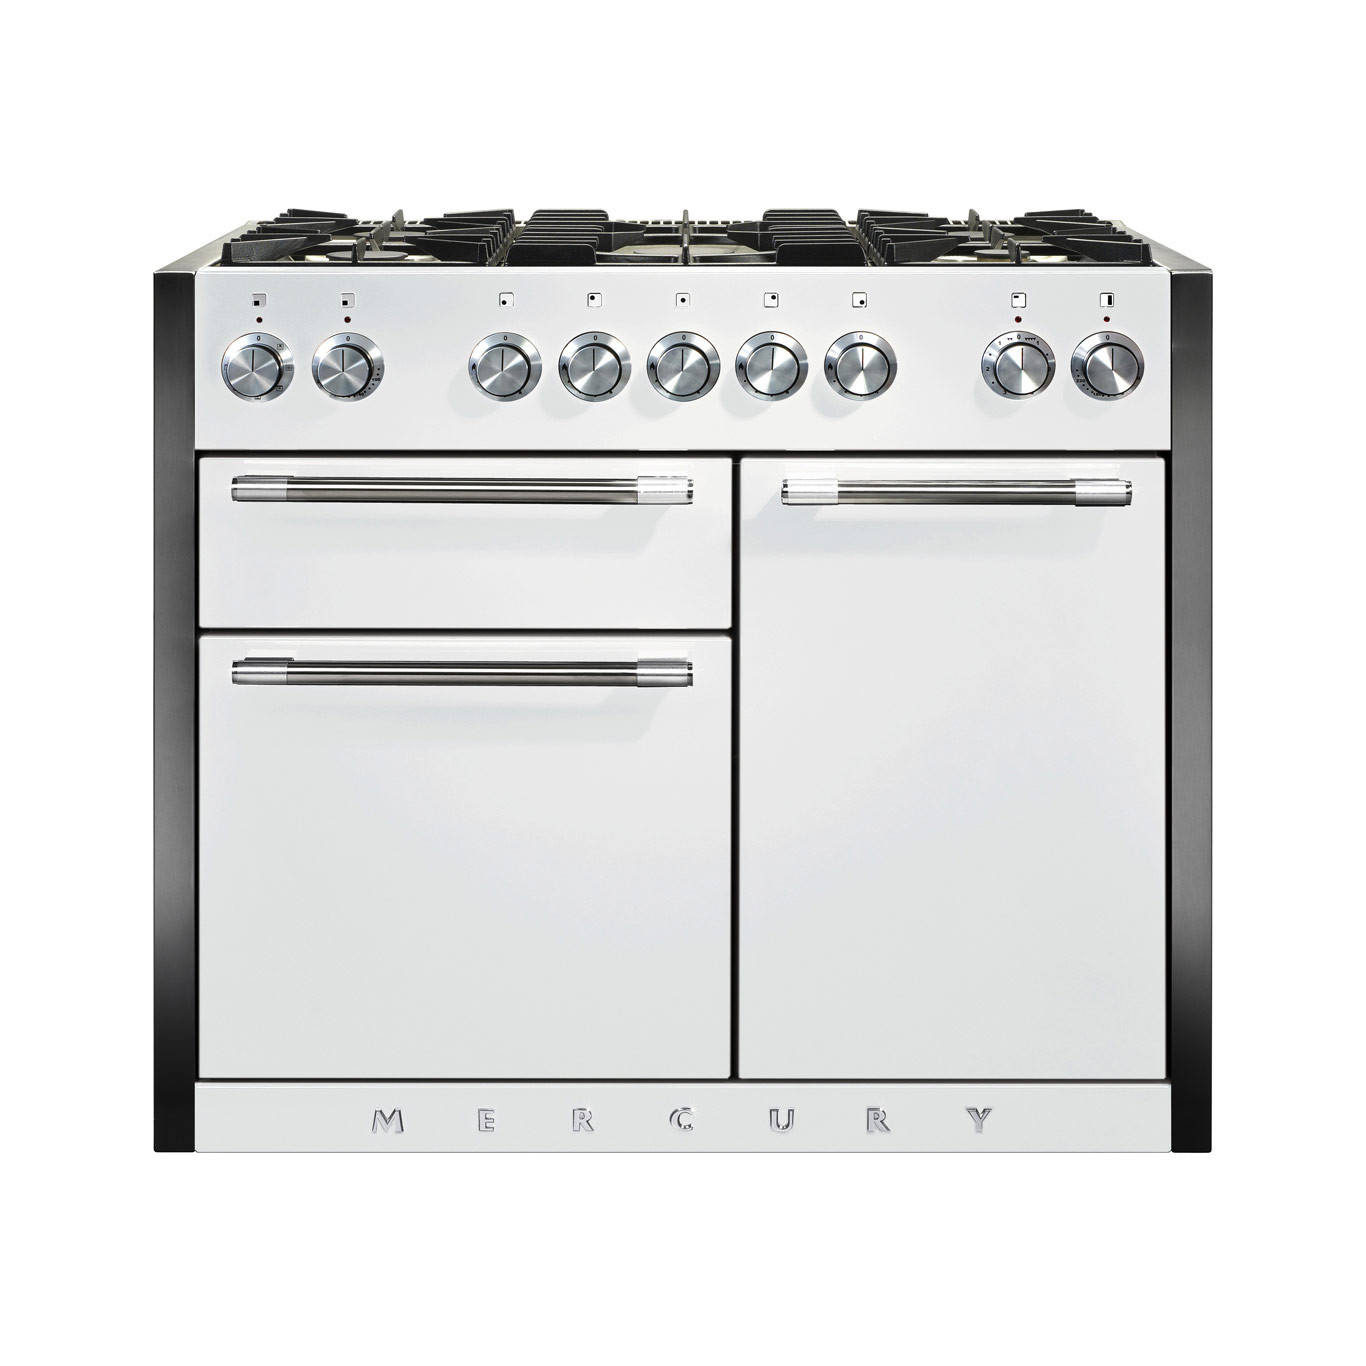 Mercury MCY1082DF Dual Fuel Snowdrop Range Cooker